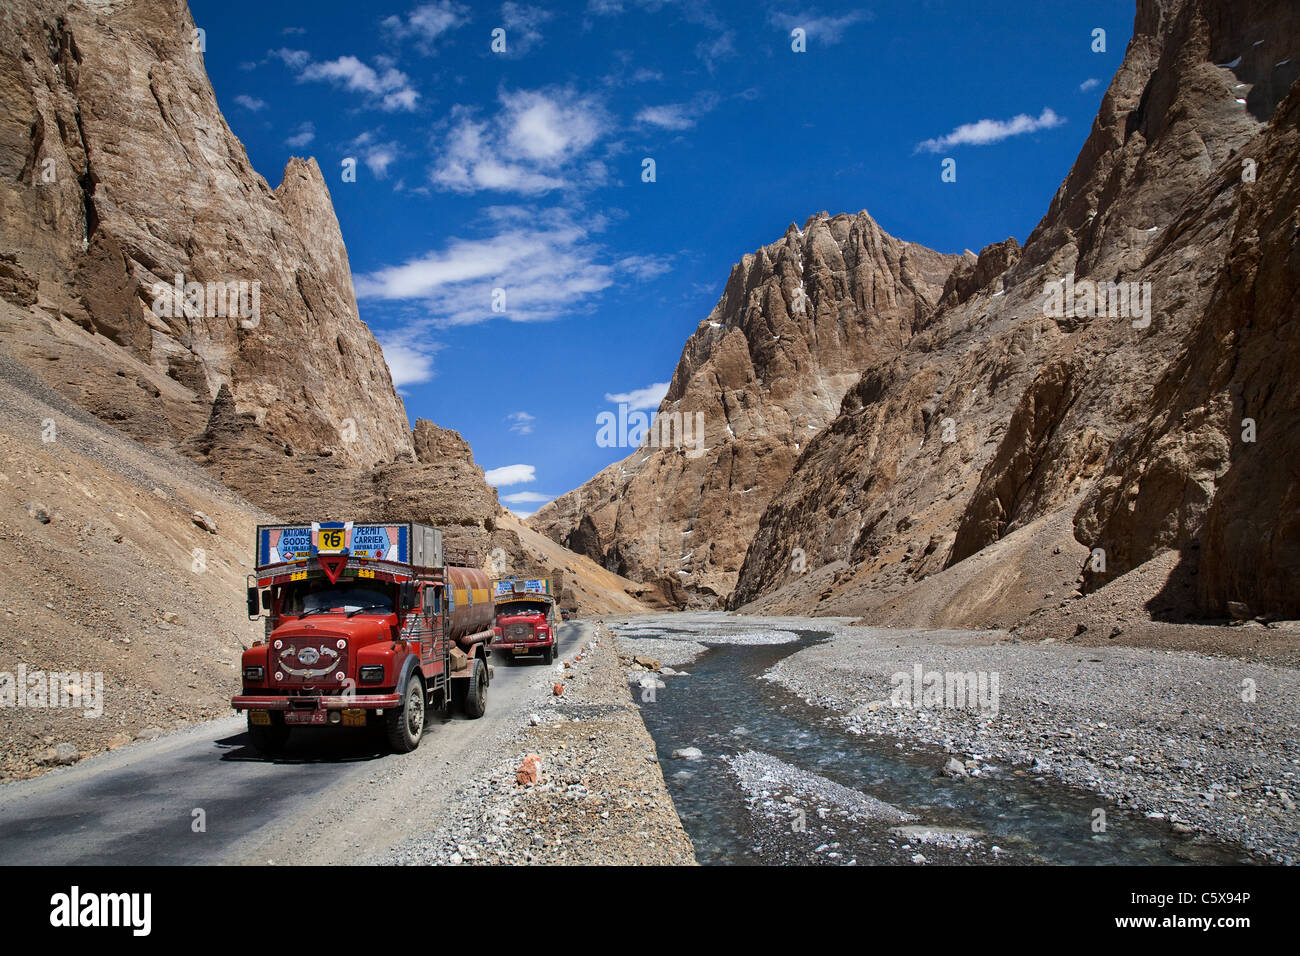 Trucks carrying petrol going through Leh- Manali road. Ladakh. India - Stock Image